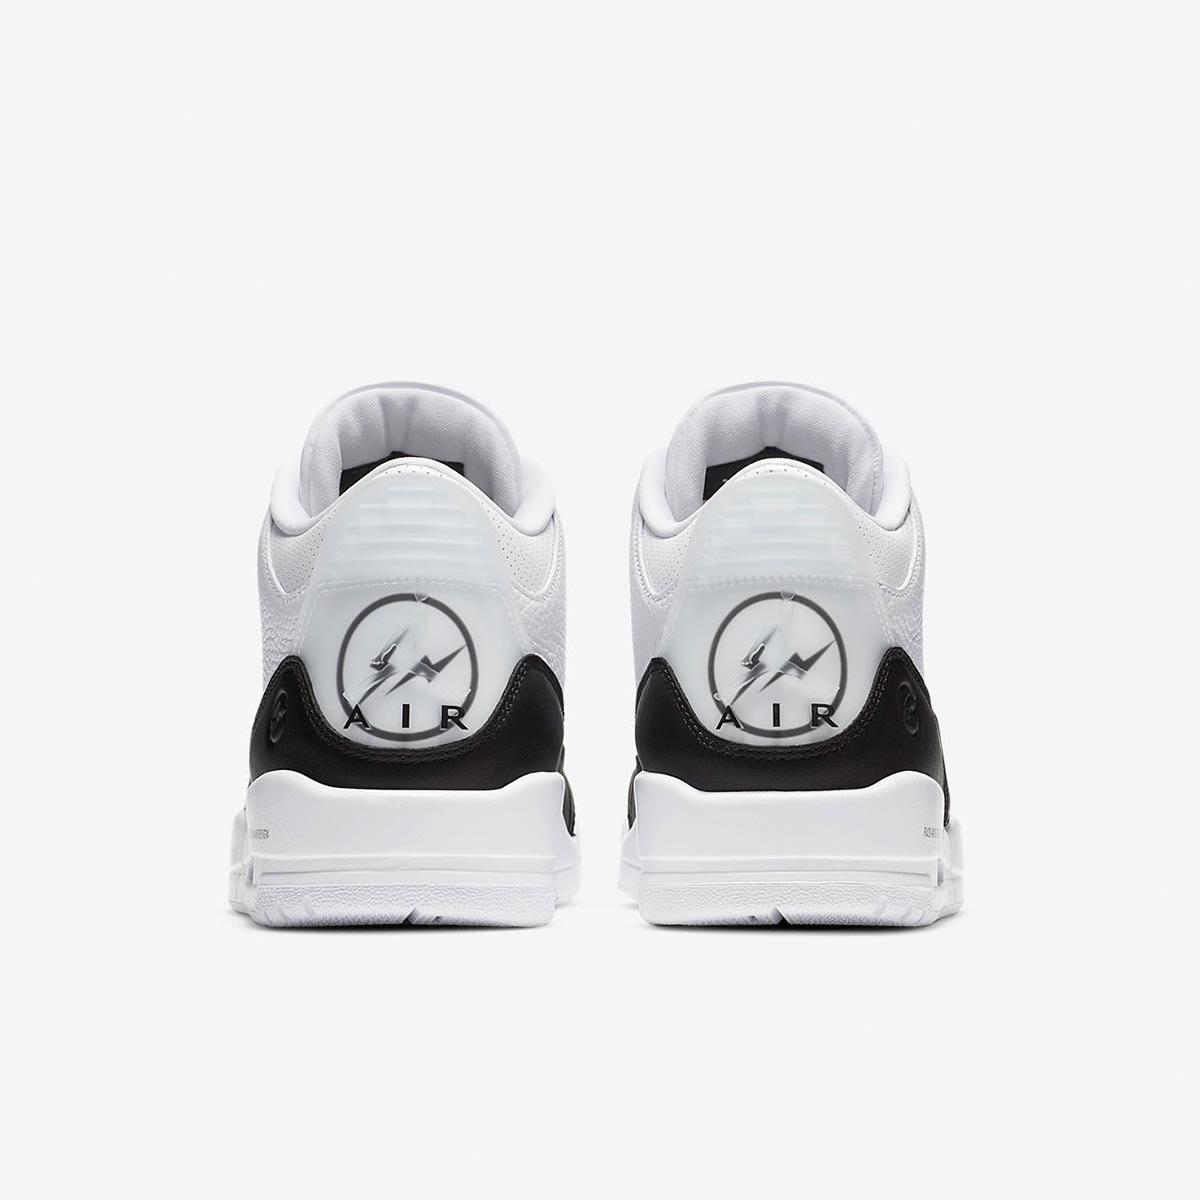 Air Jordan x Fragment Design